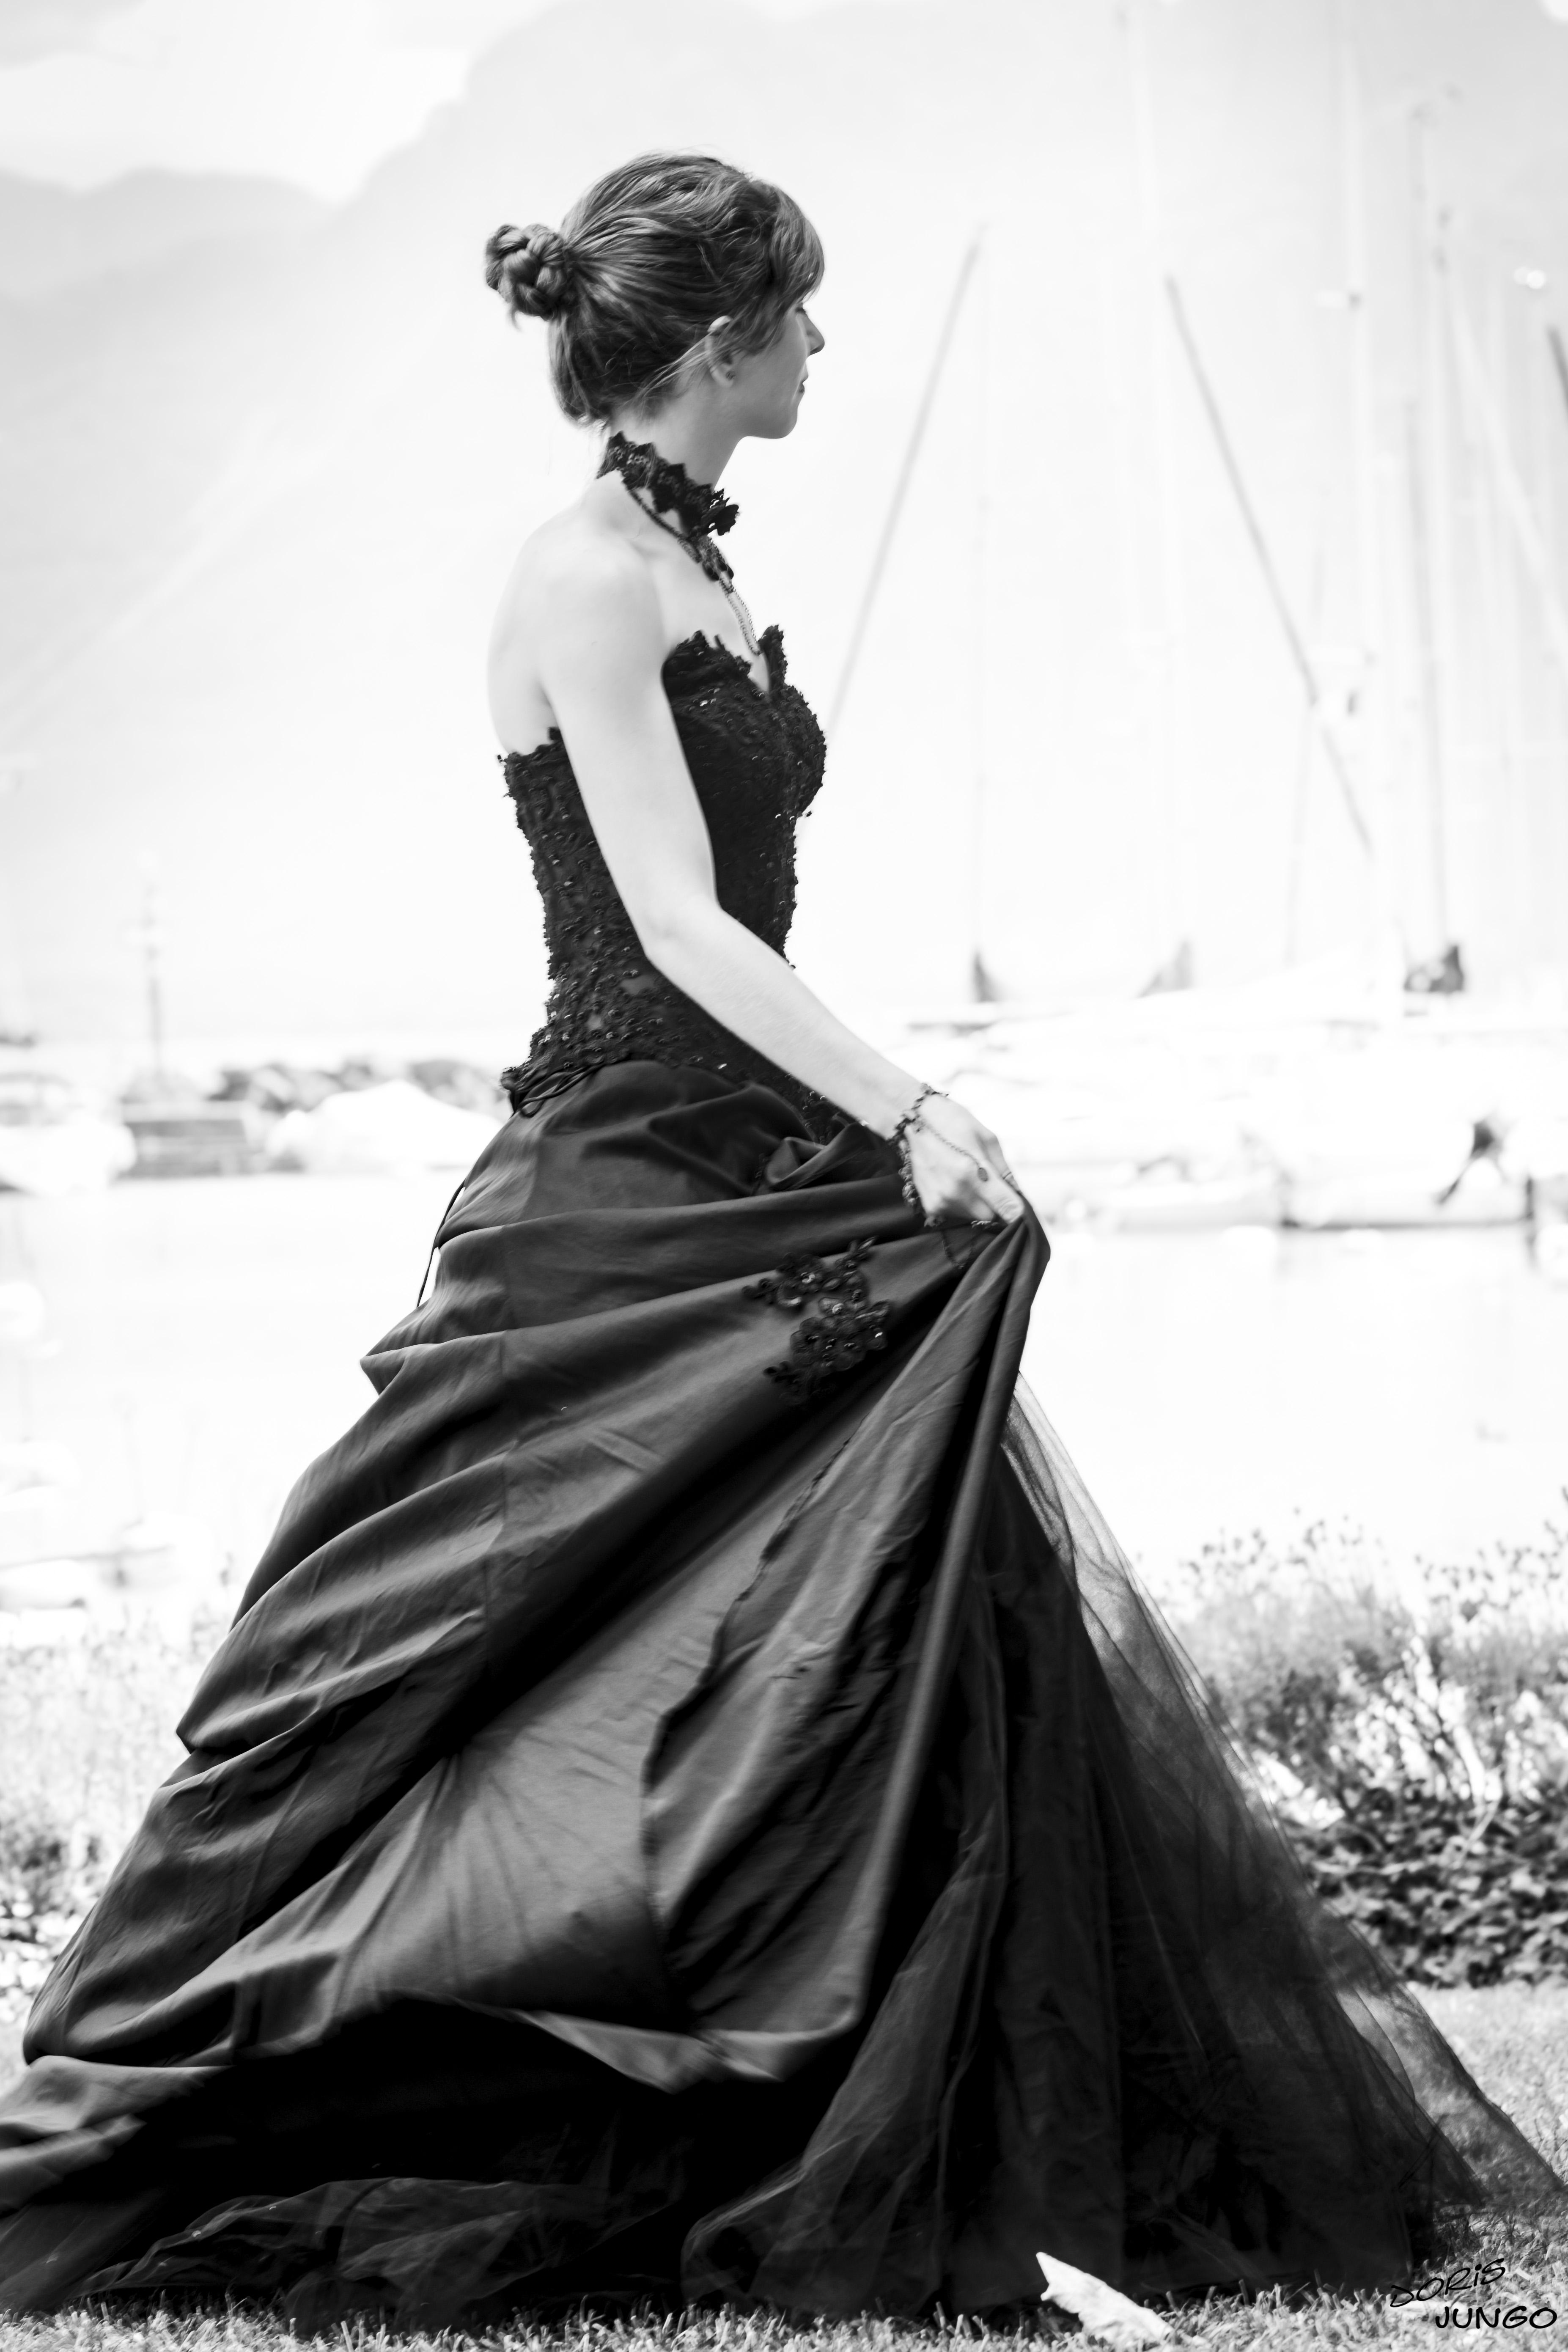 Marina Lessieur